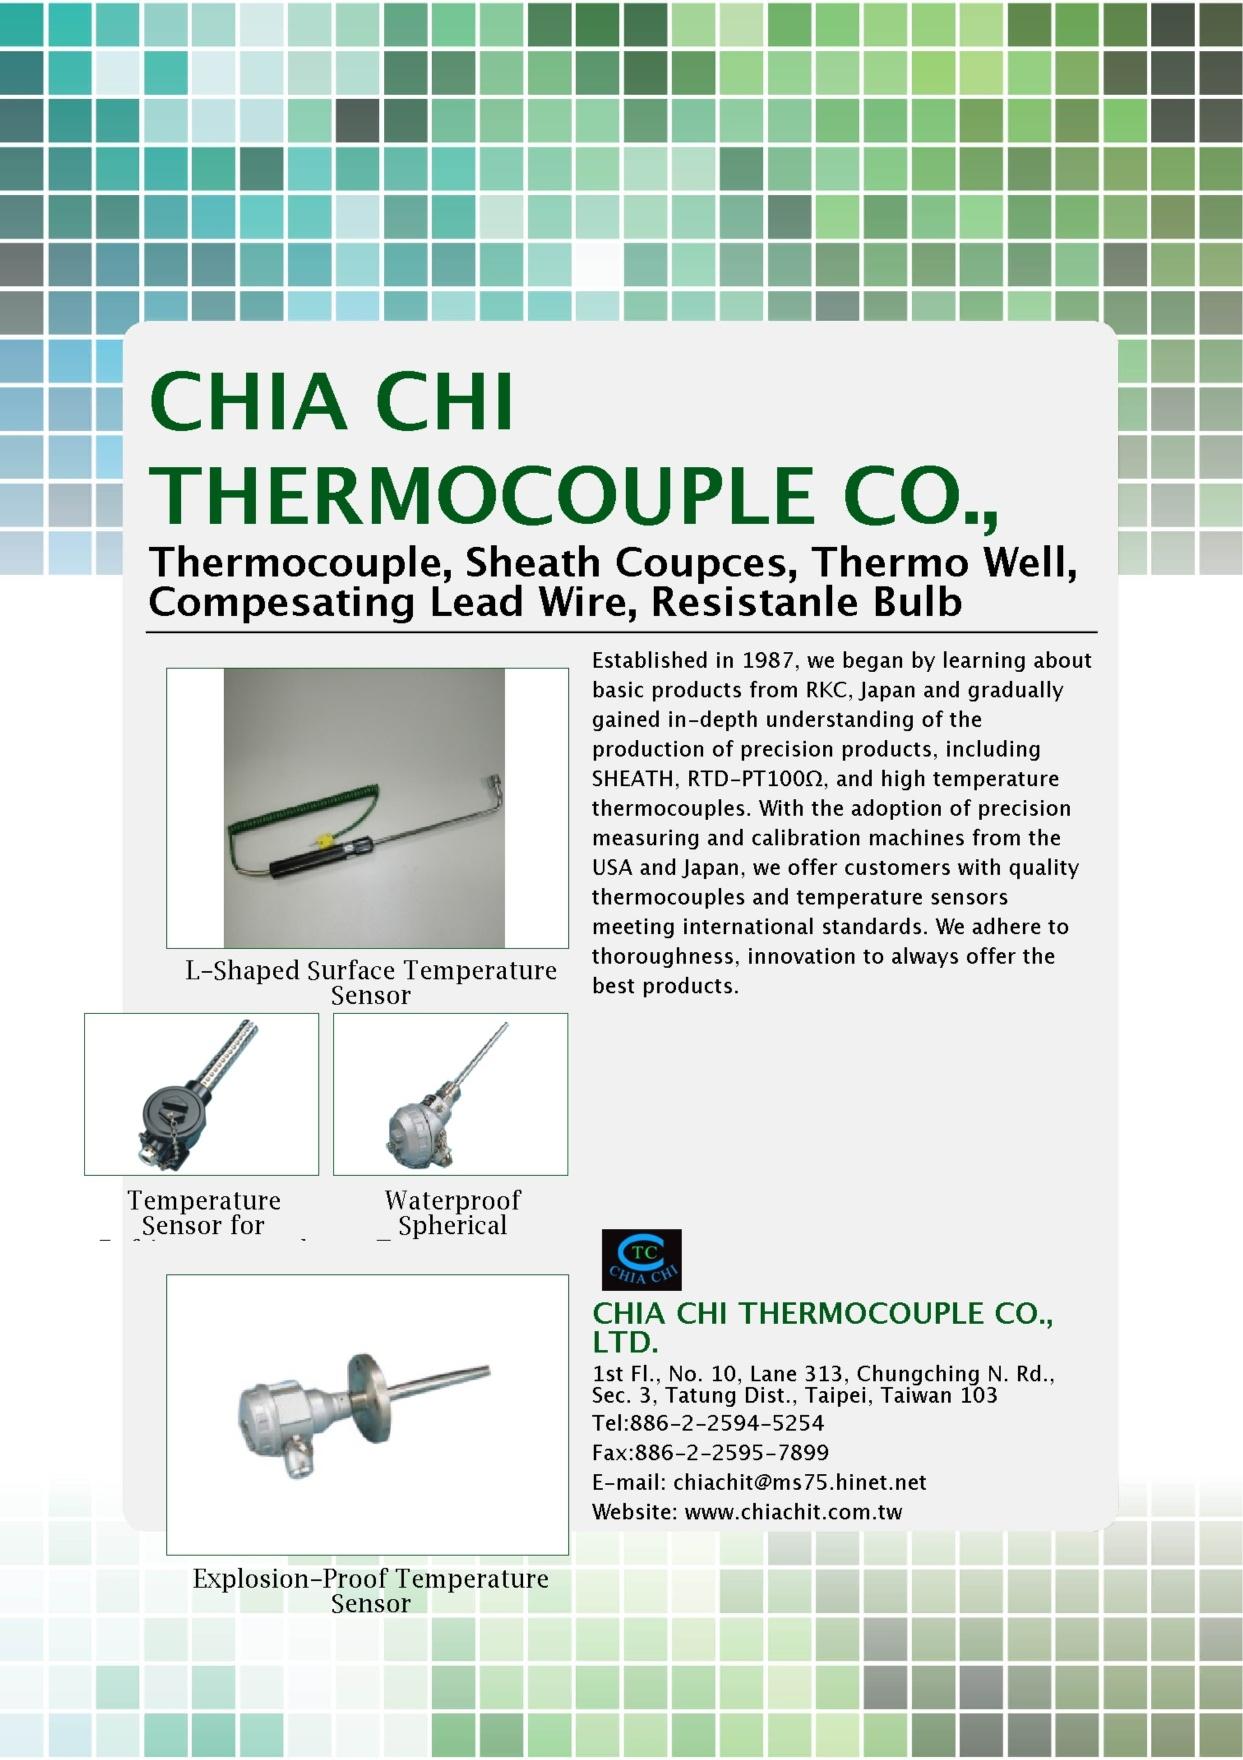 Electronics & Computers E-Magazine CHIA CHI THERMOCOUPLE CO., LTD.